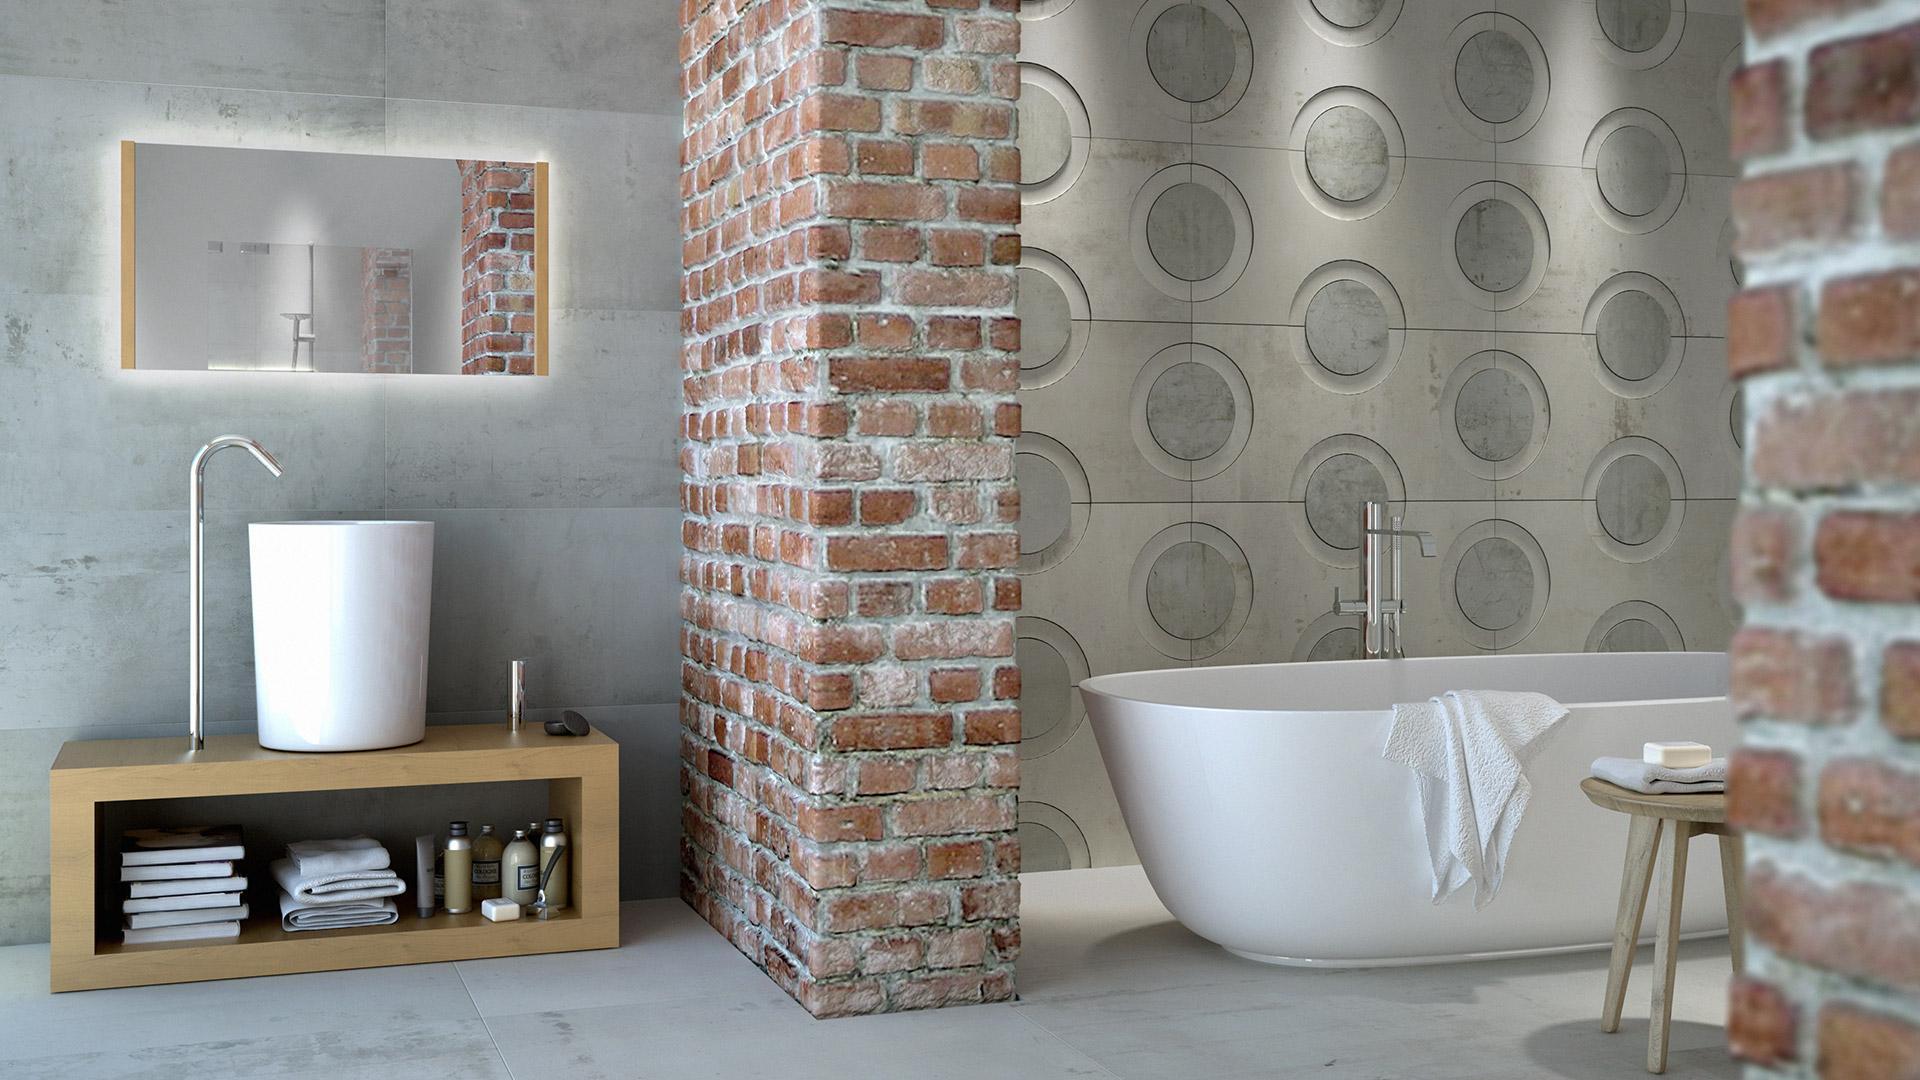 Bechet ceramic belgique arlon weyler 28 images for Carrelage exterieur interieur